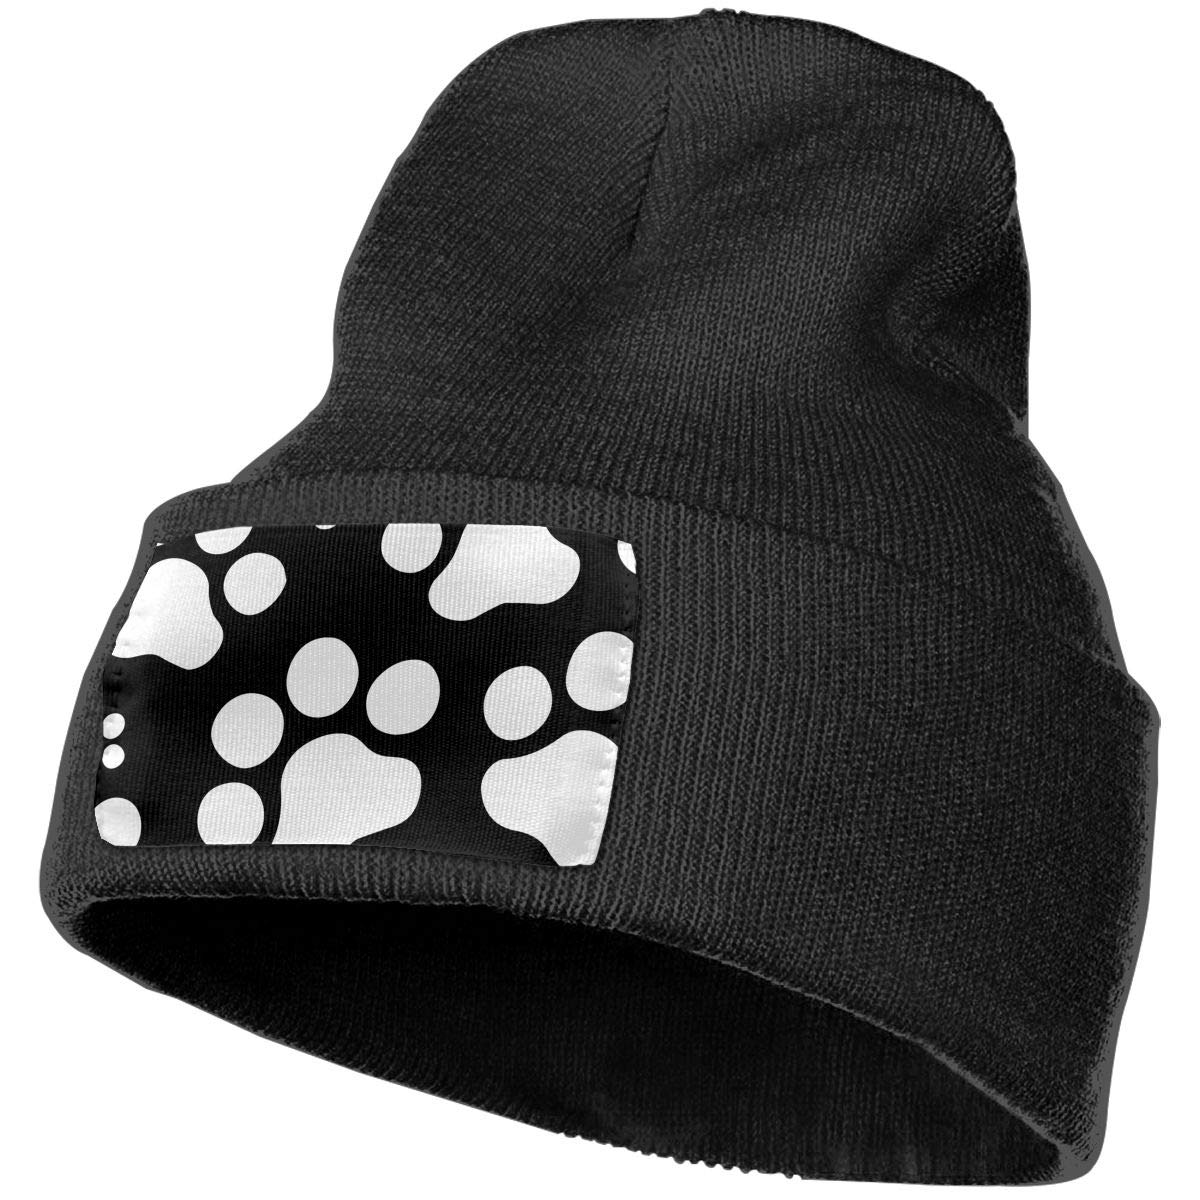 Horizon-t Paw Prints Unisex 100/% Acrylic Knitting Hat Cap Fashion Beanie Hat